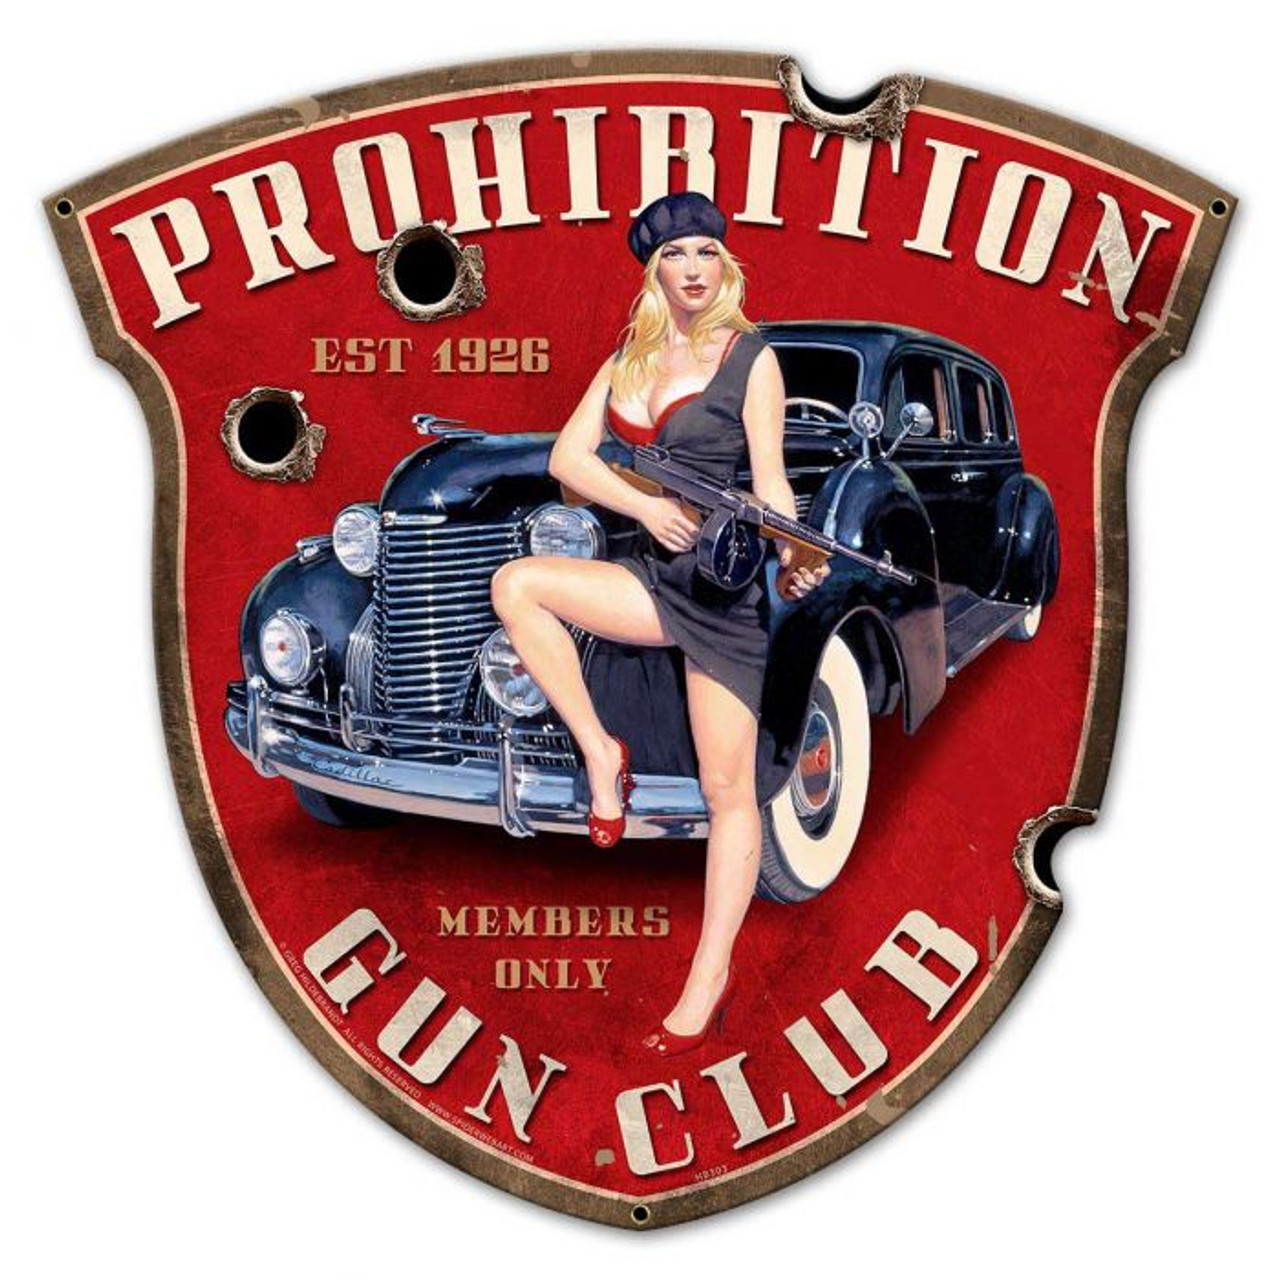 Prohibition Gun Club Shield Metal Sign 16 x 16 Inches